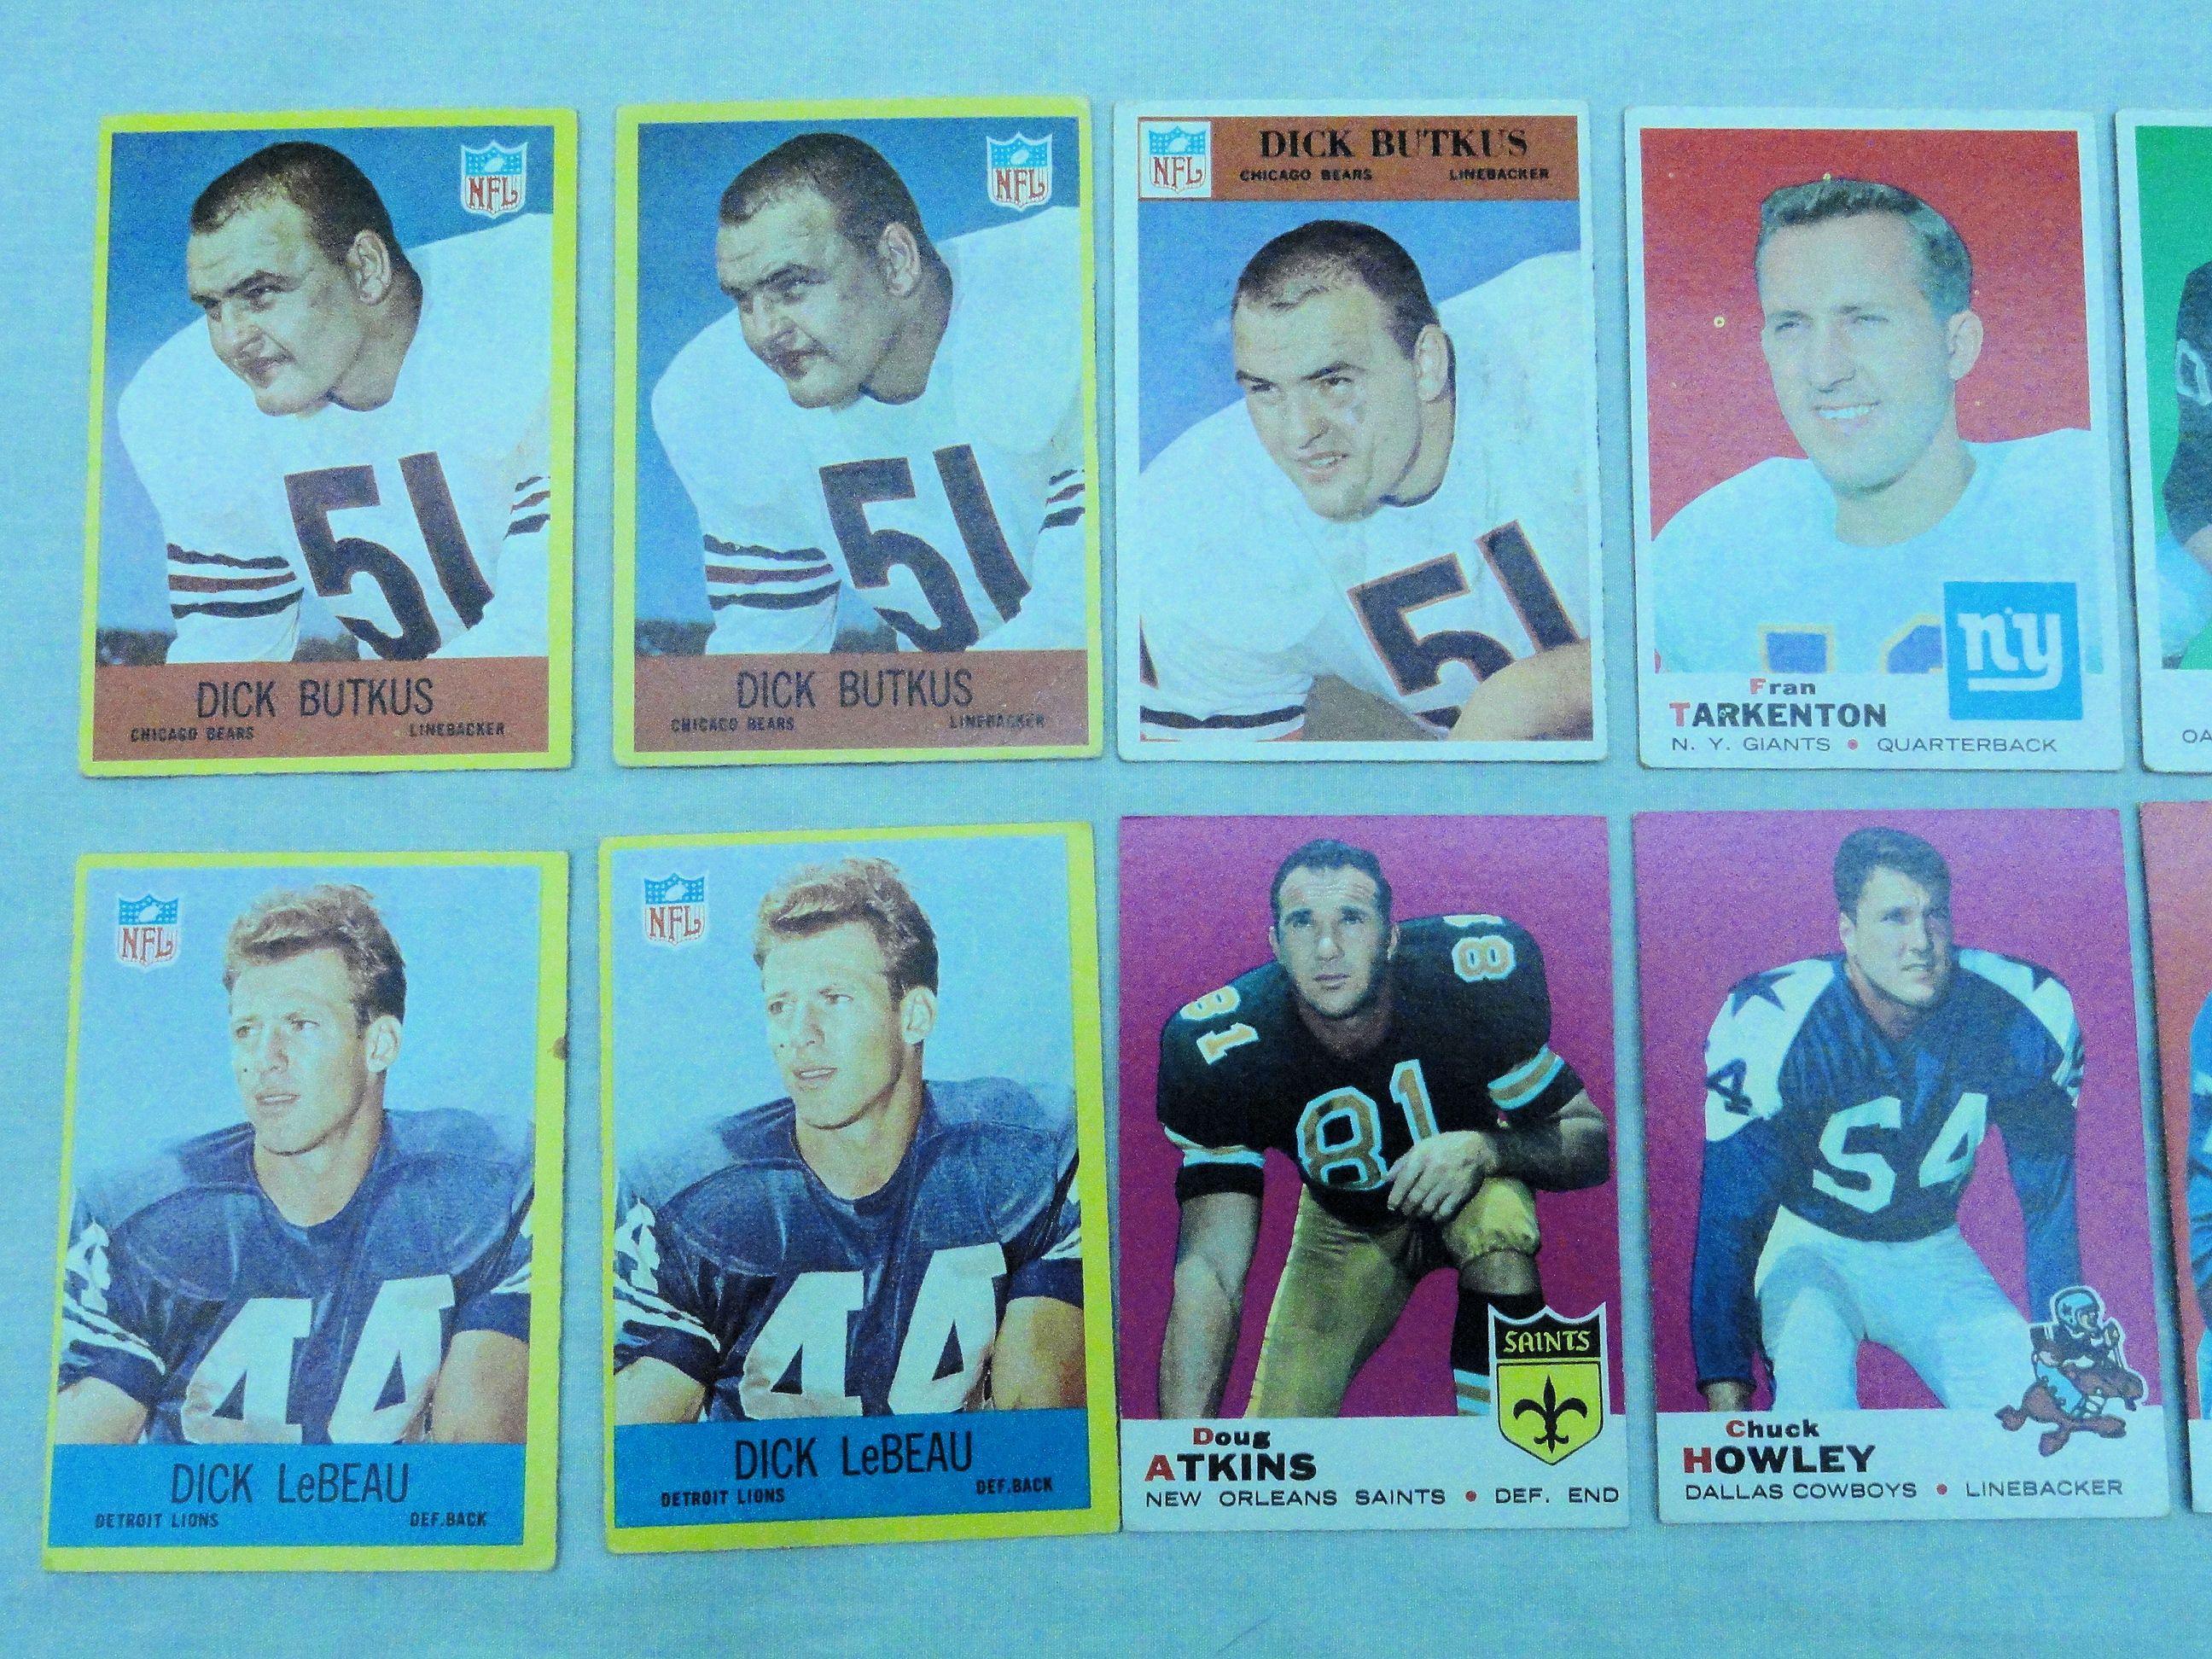 Dick butkus rookie card